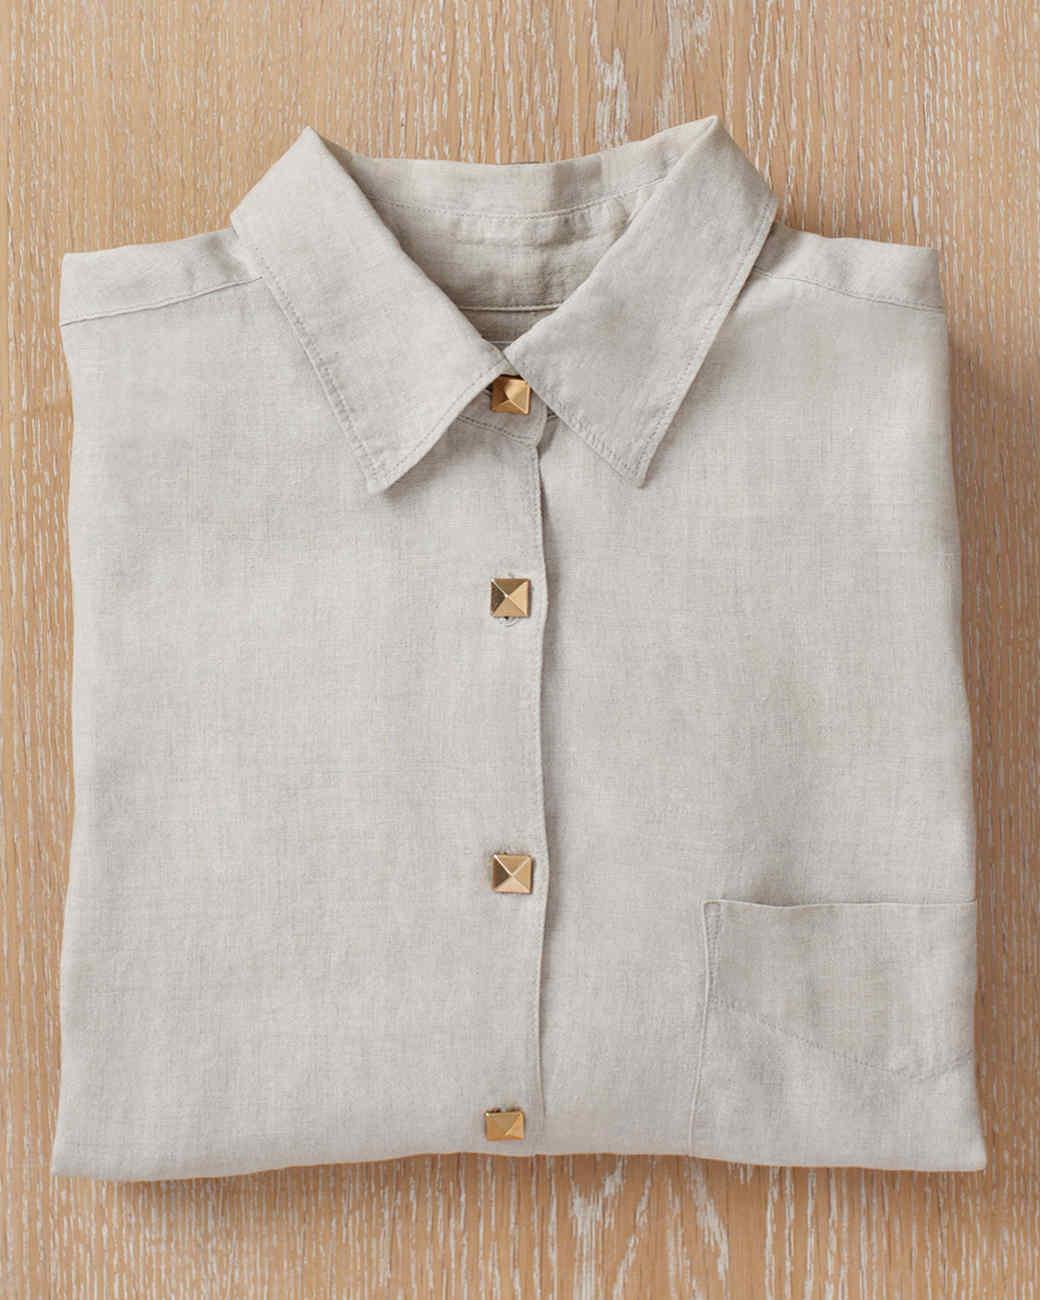 studded-shirt-wld109036.jpg